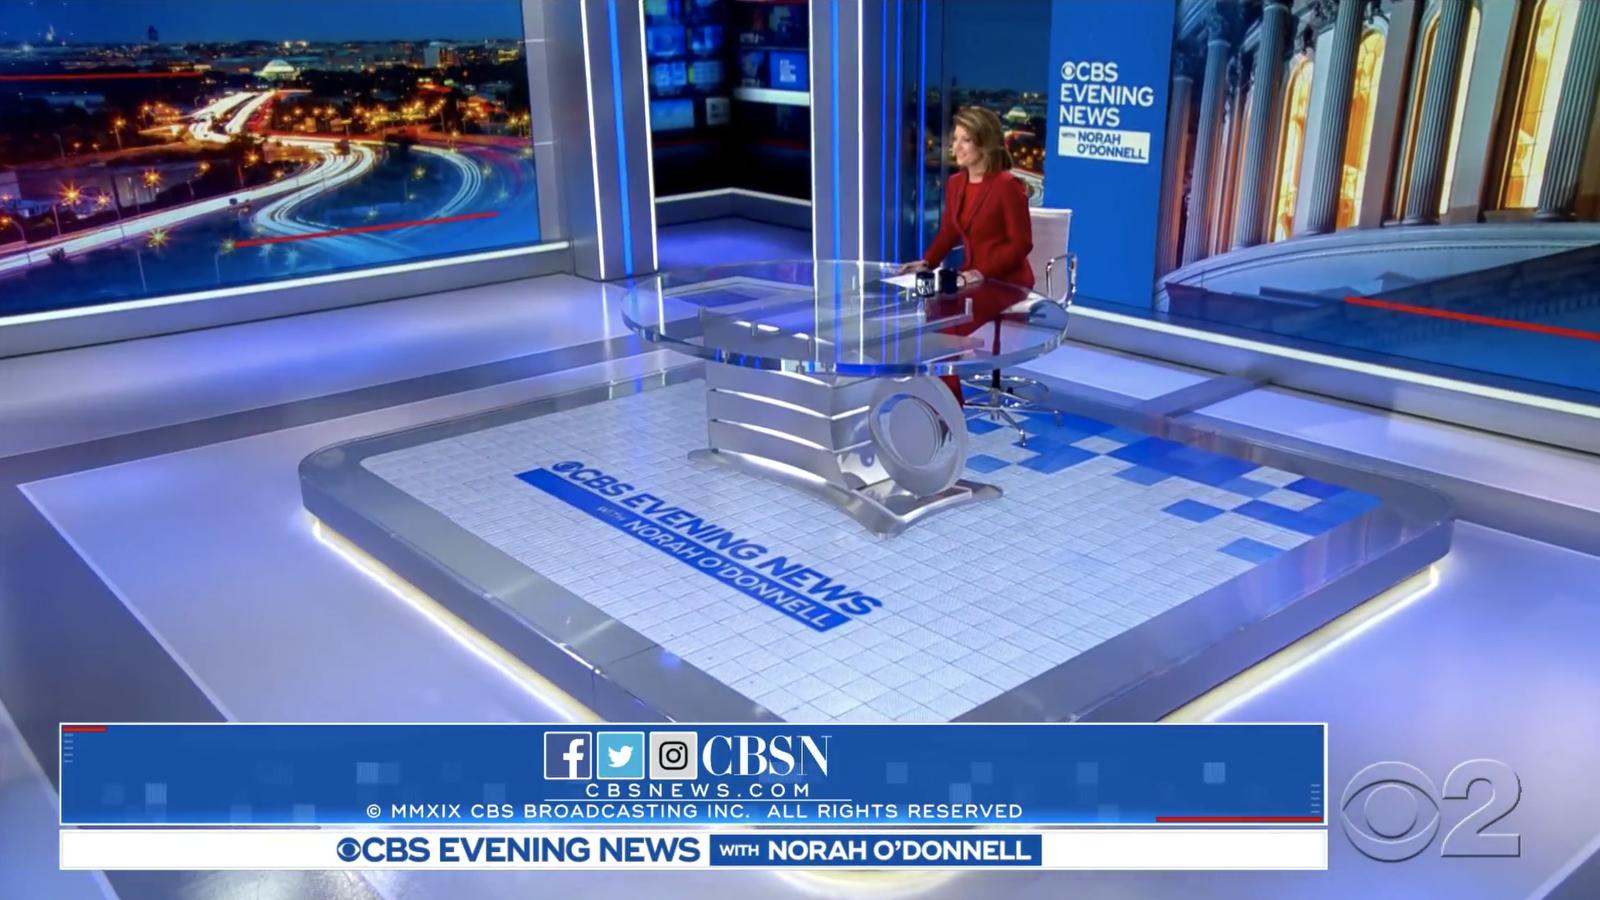 NCS_CBS-News-Washington-Bureau_STUDIO-2019_0015